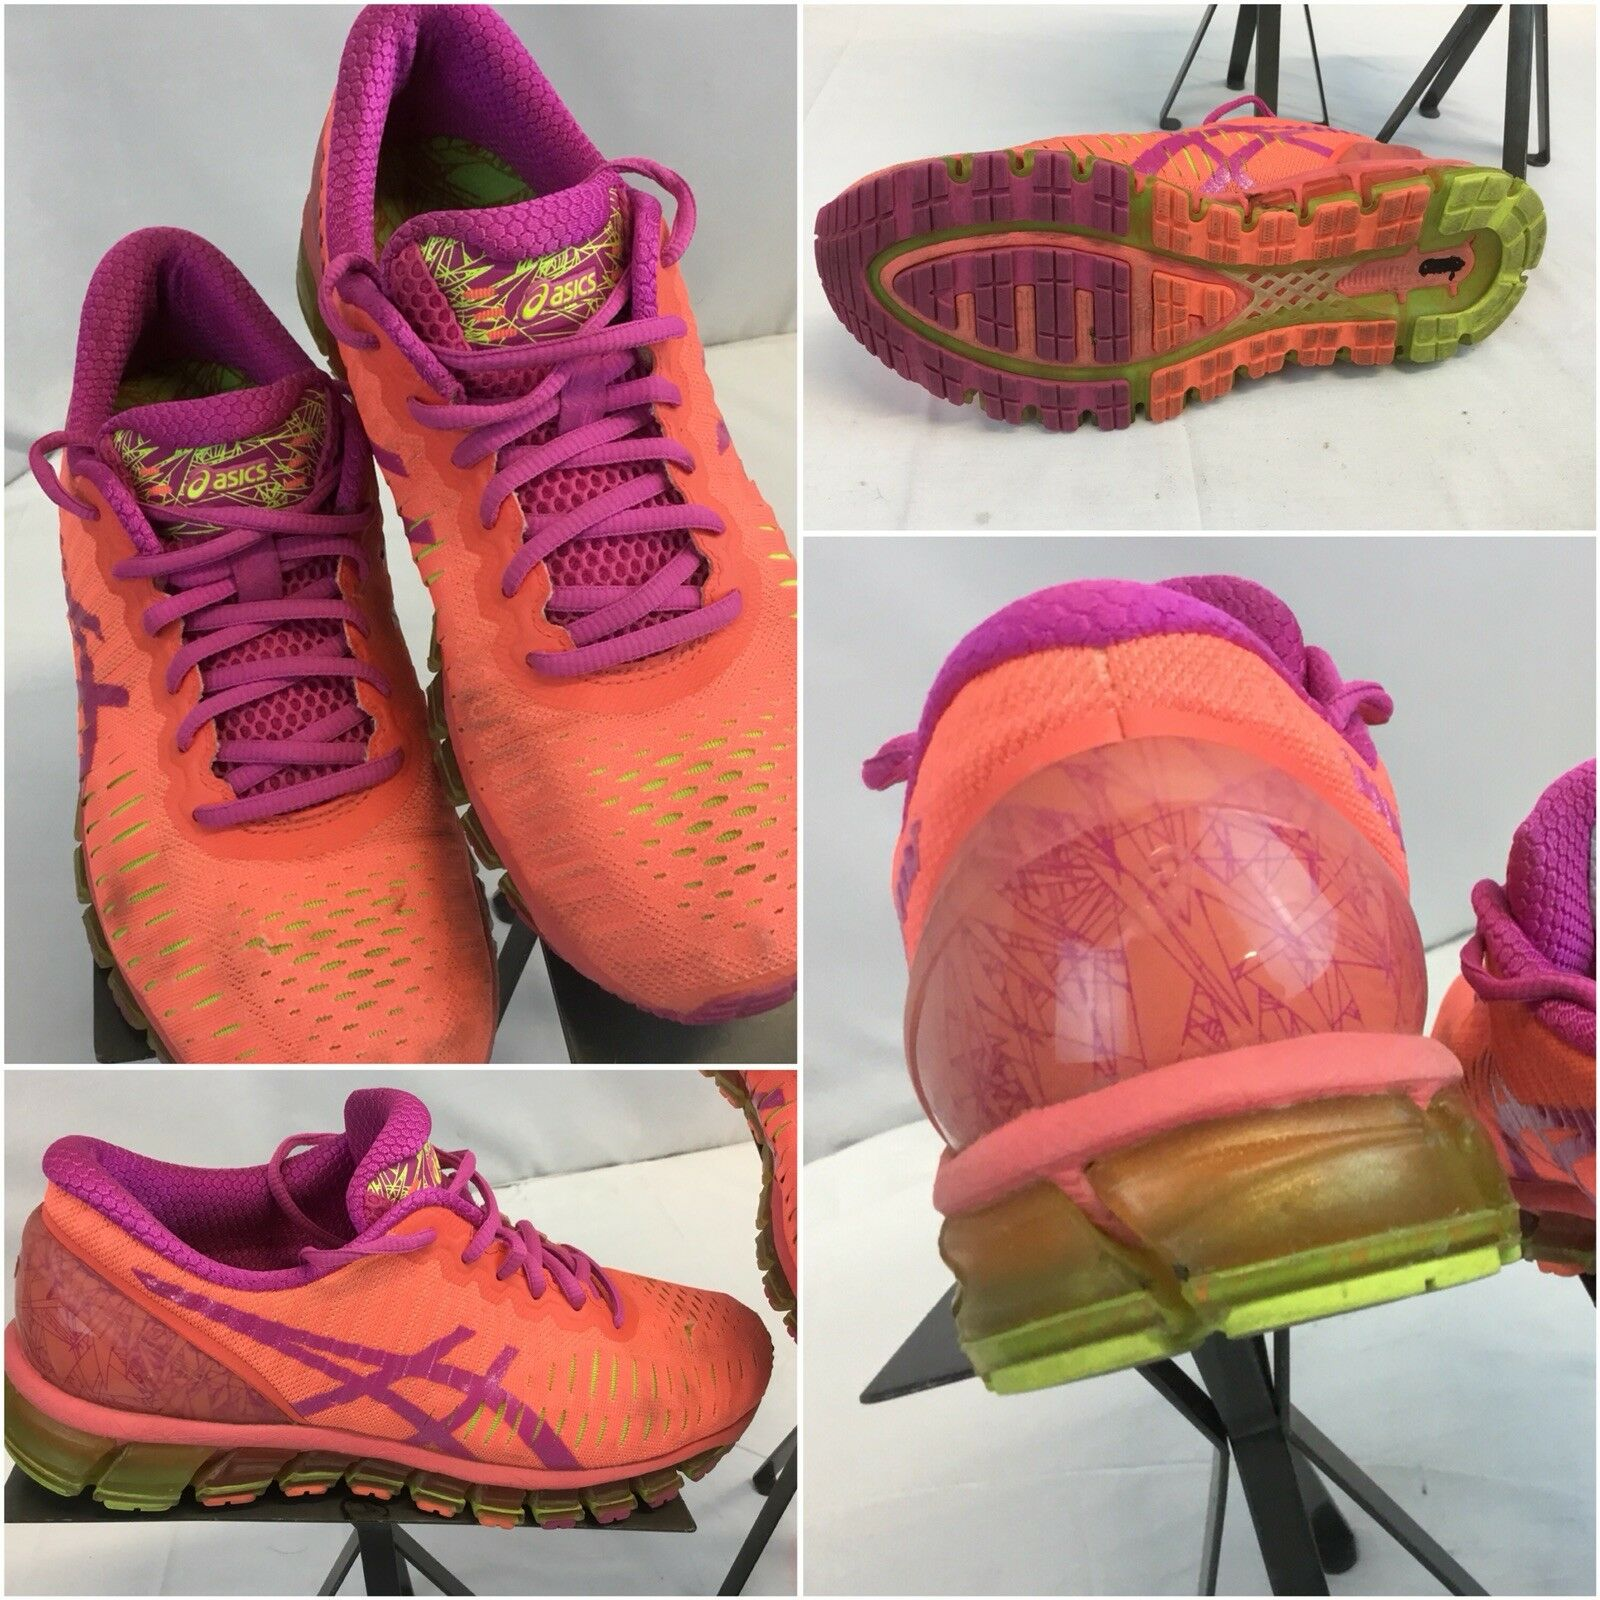 Asics Gel Quantum 360 Sz 8 Women Orange Running Shoes EUC YGI F8 Cheap and beautiful fashion